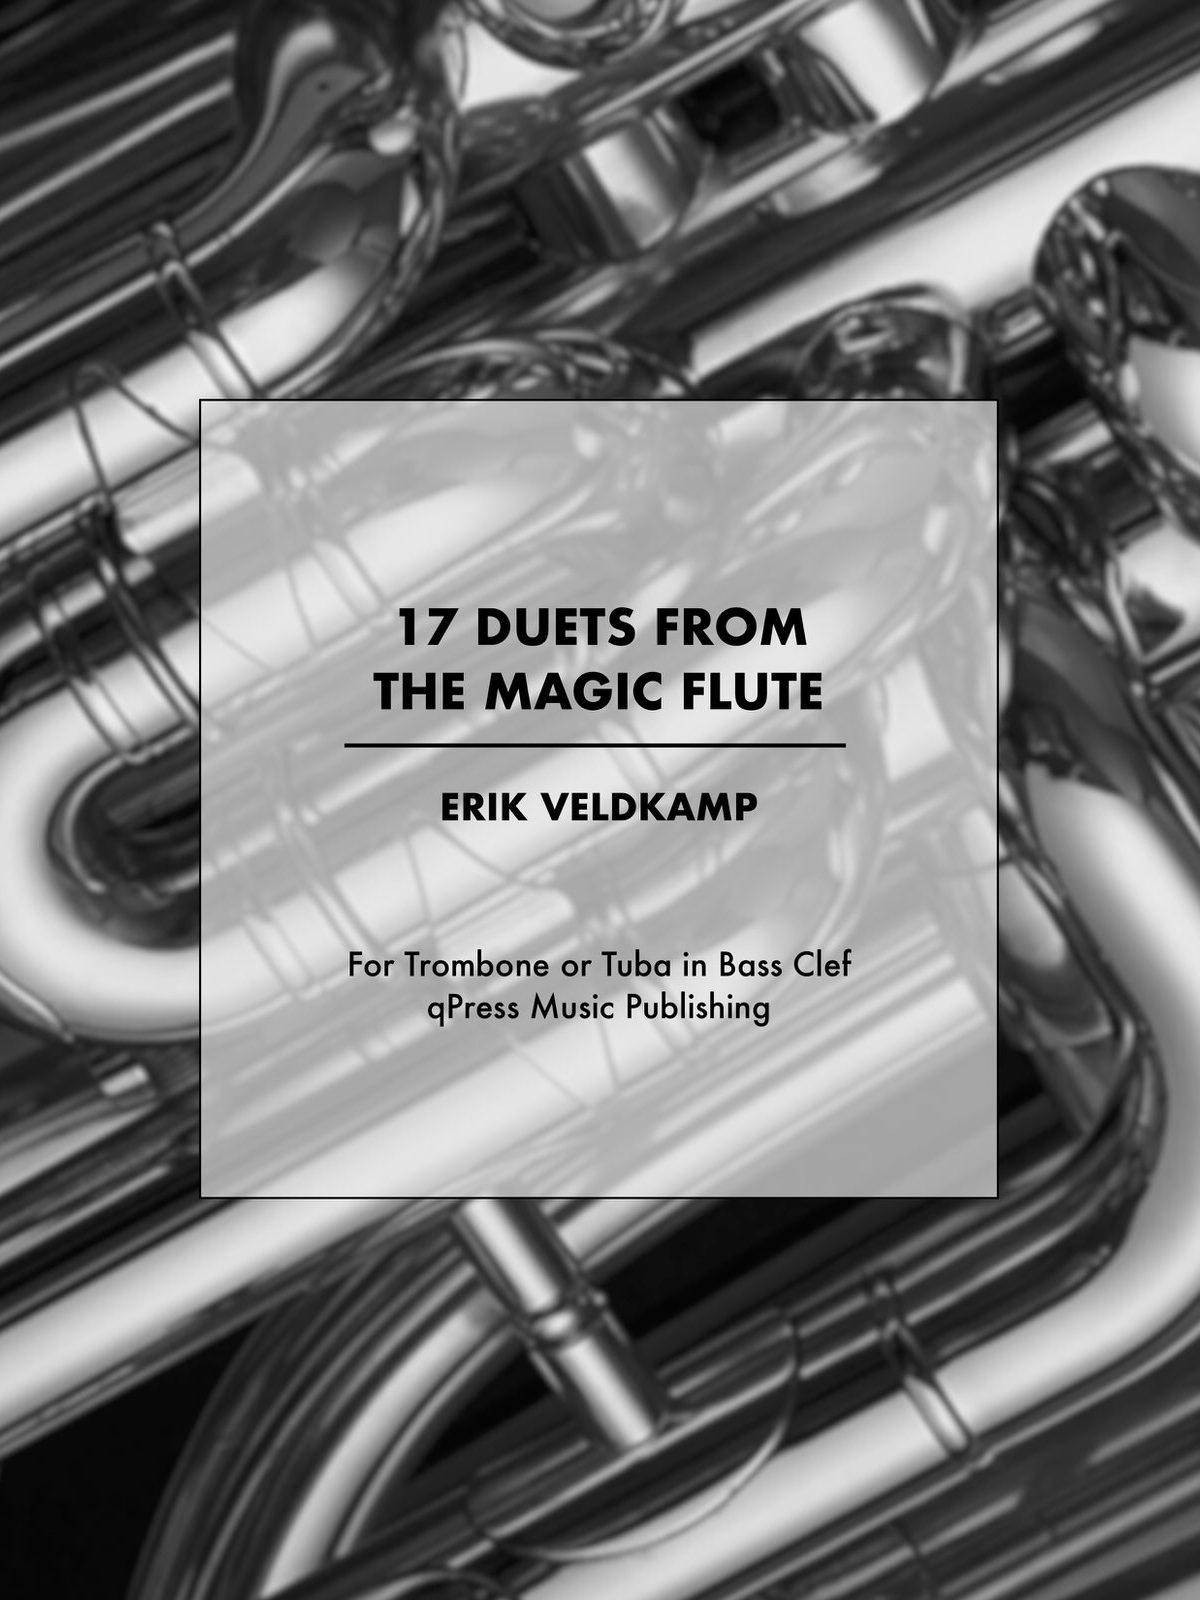 Veldkamp Trombone Duets from Magic Flute